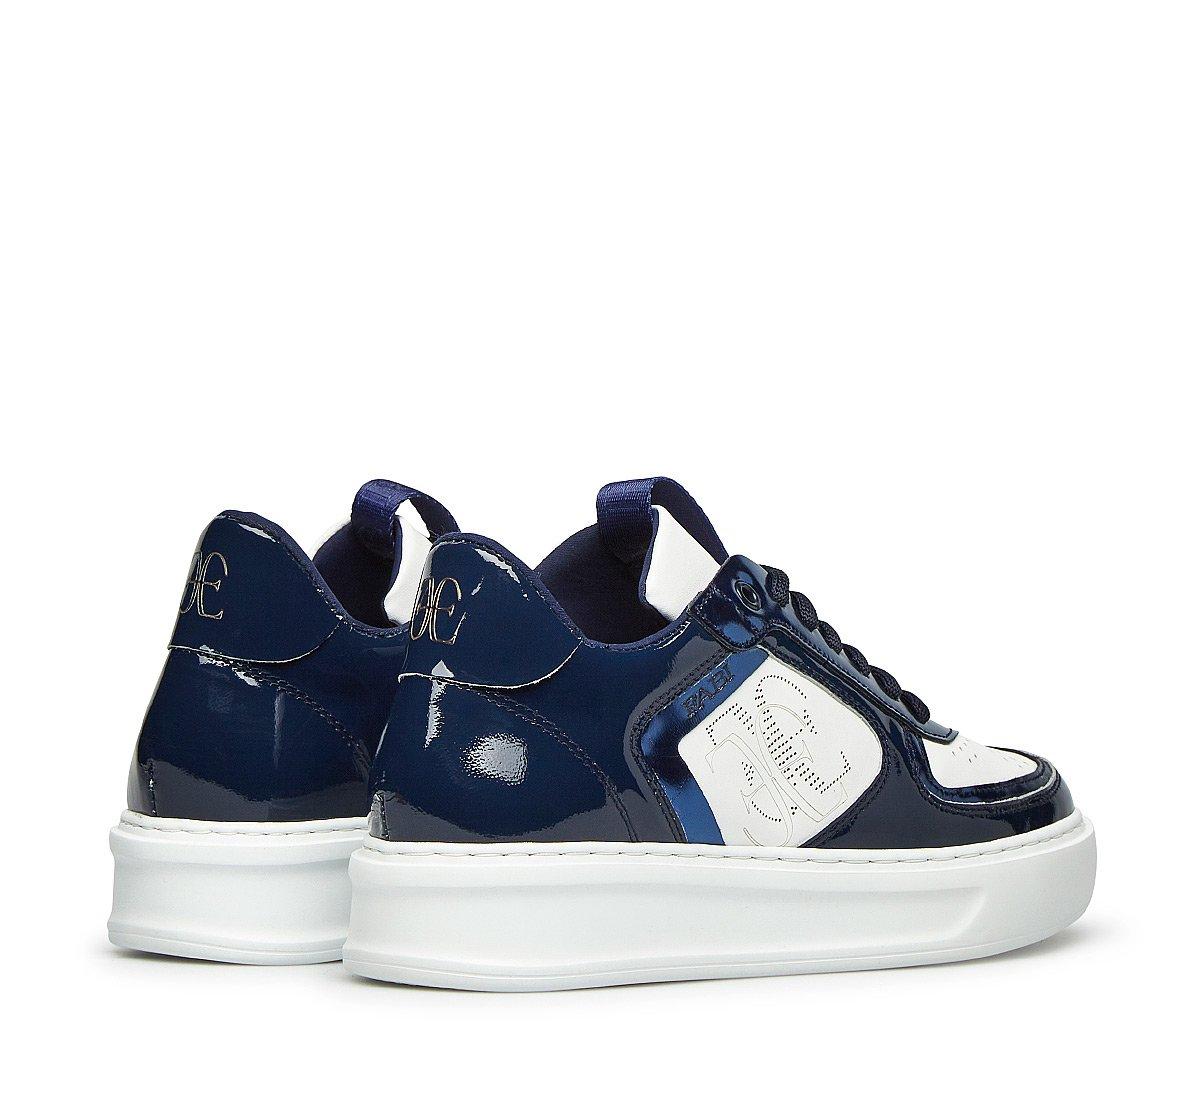 Flaminio sneakers